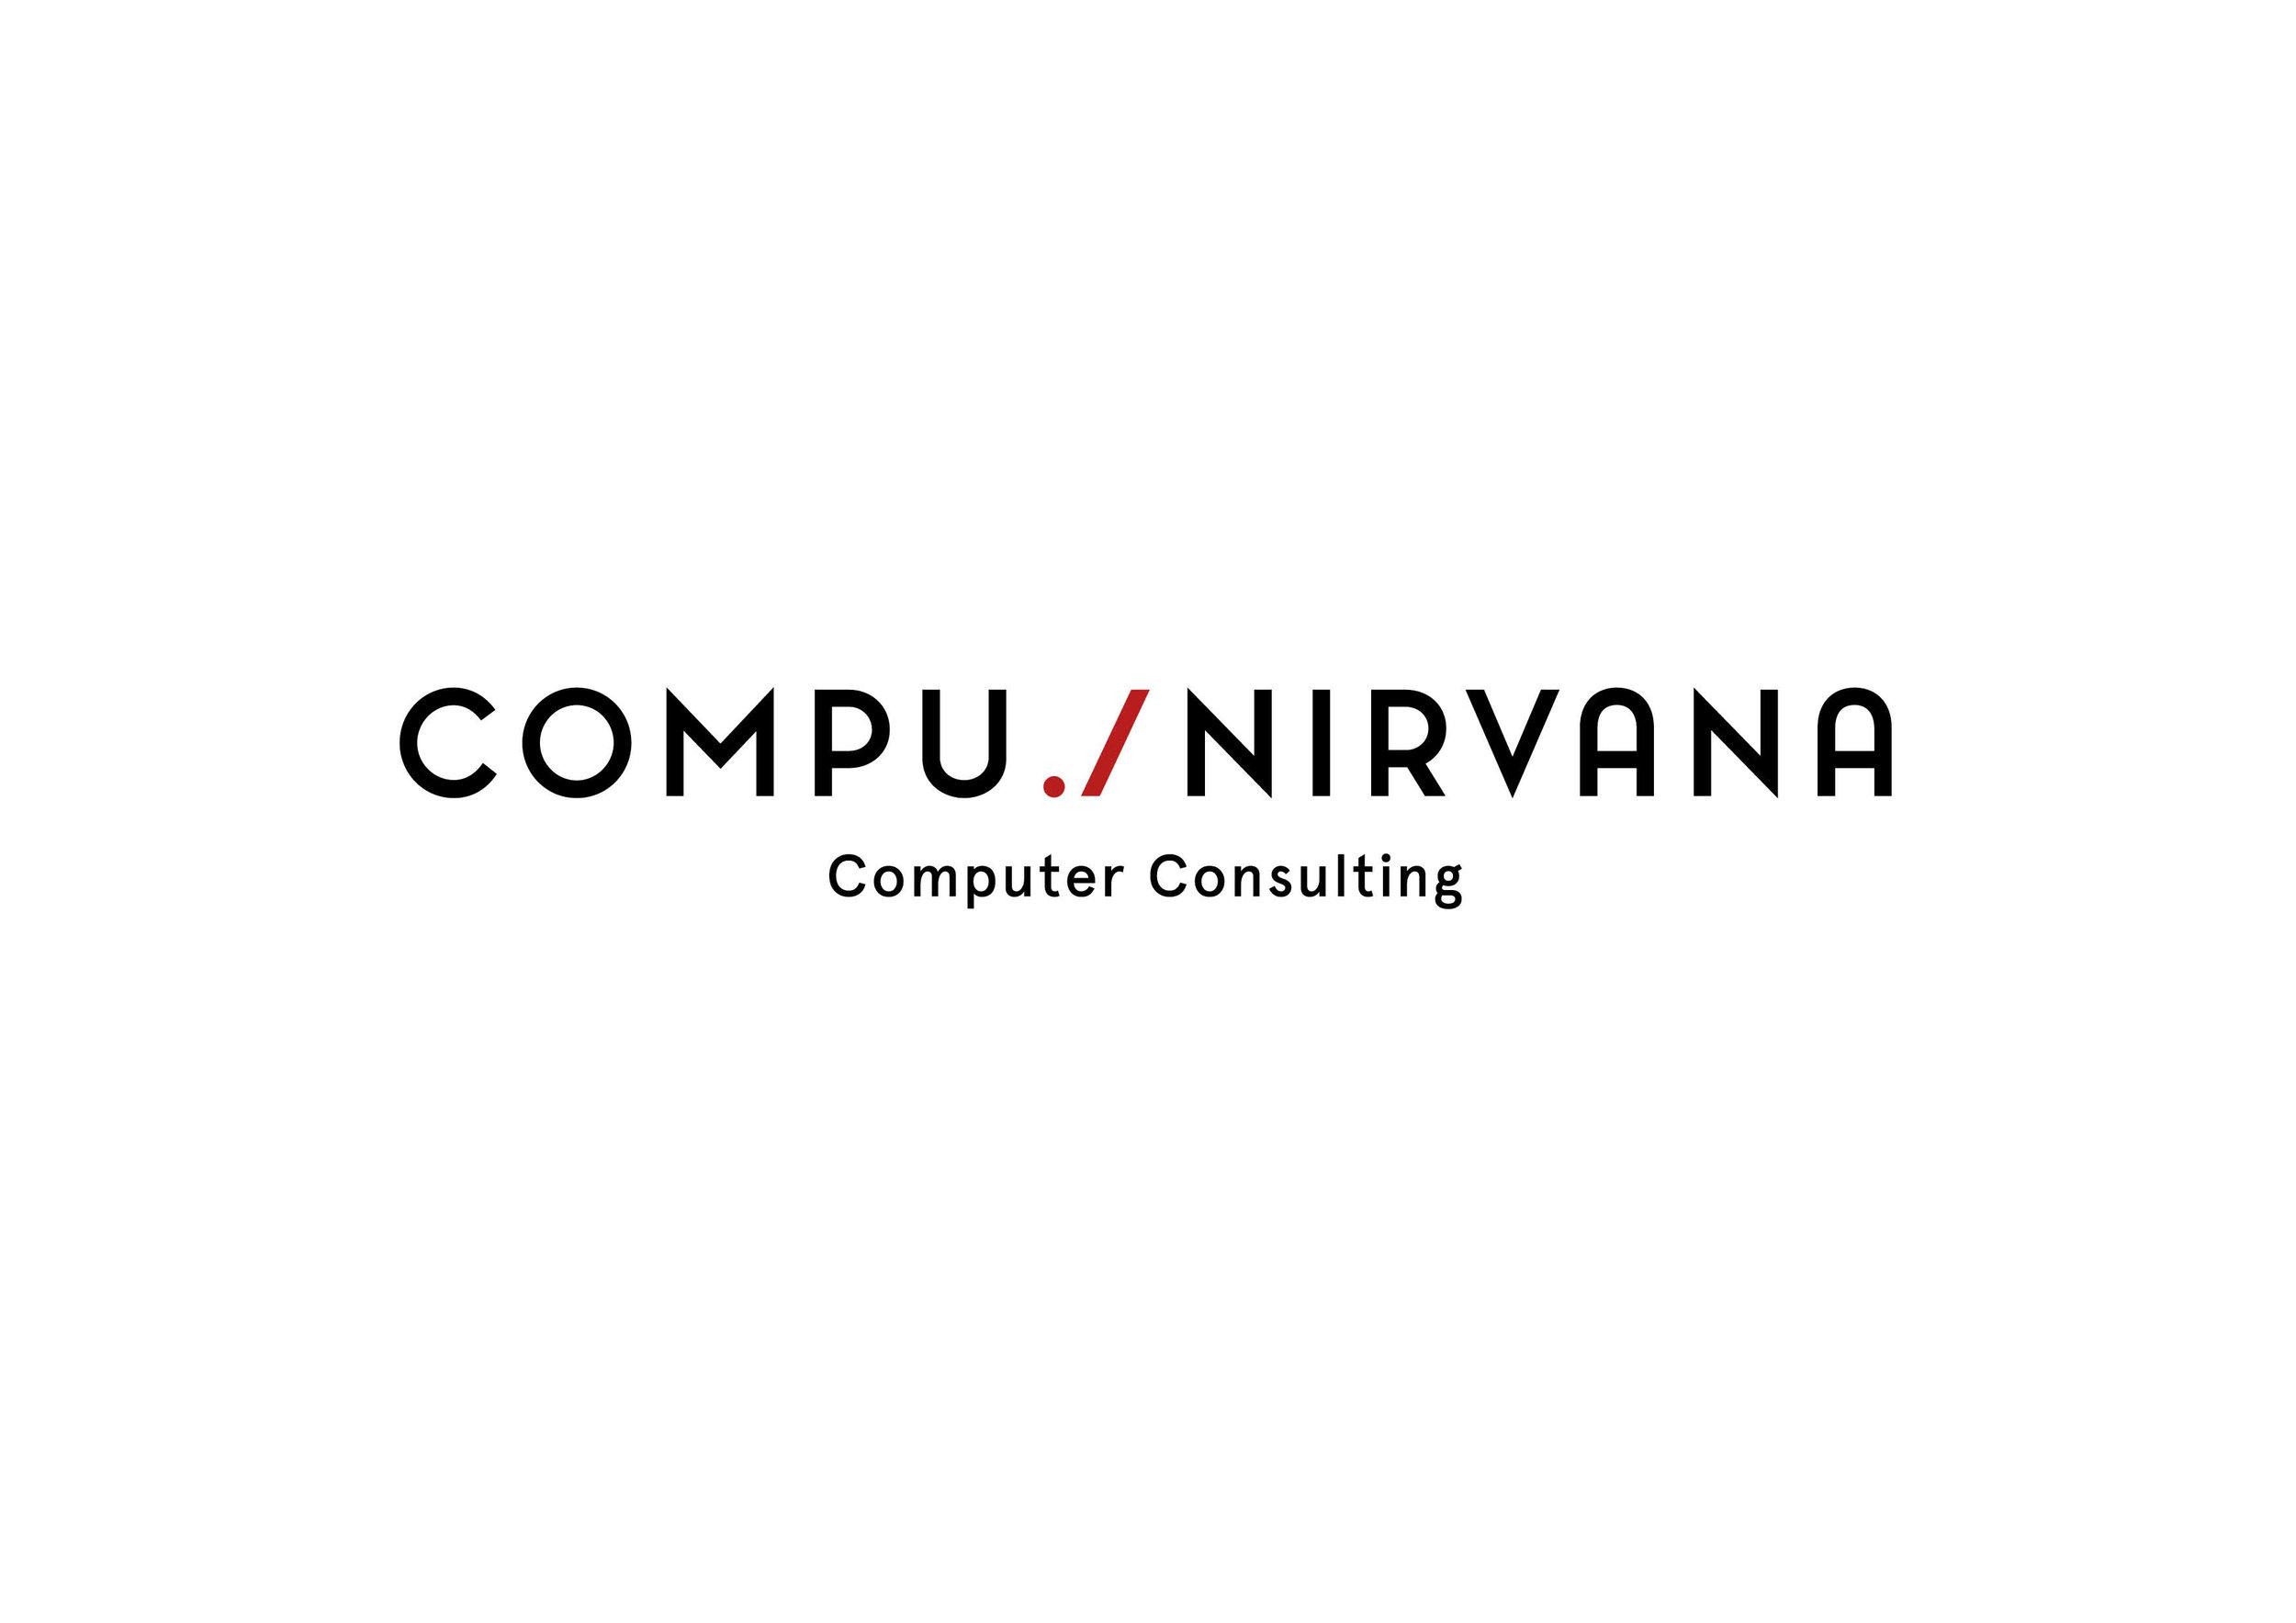 Logo.CompuNirvana.jpg